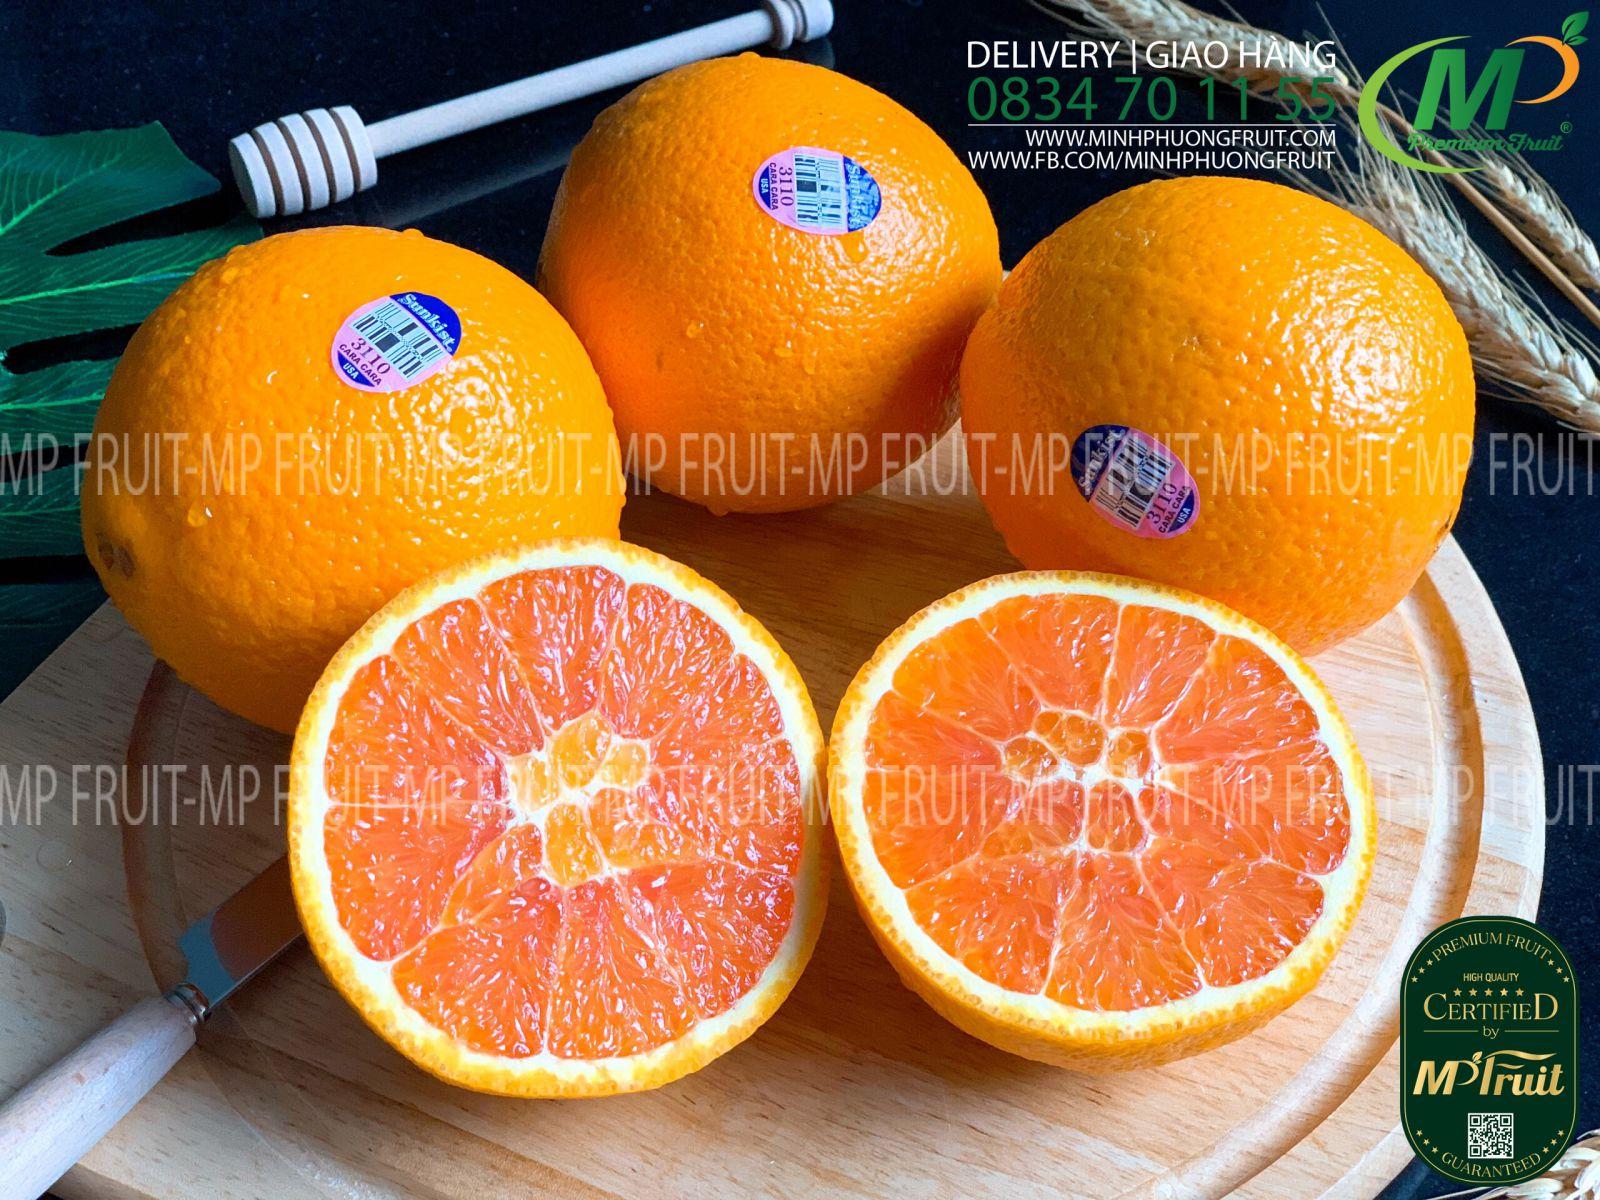 Cam Đỏ Cara Sunkist Mỹ tại MP Fruit